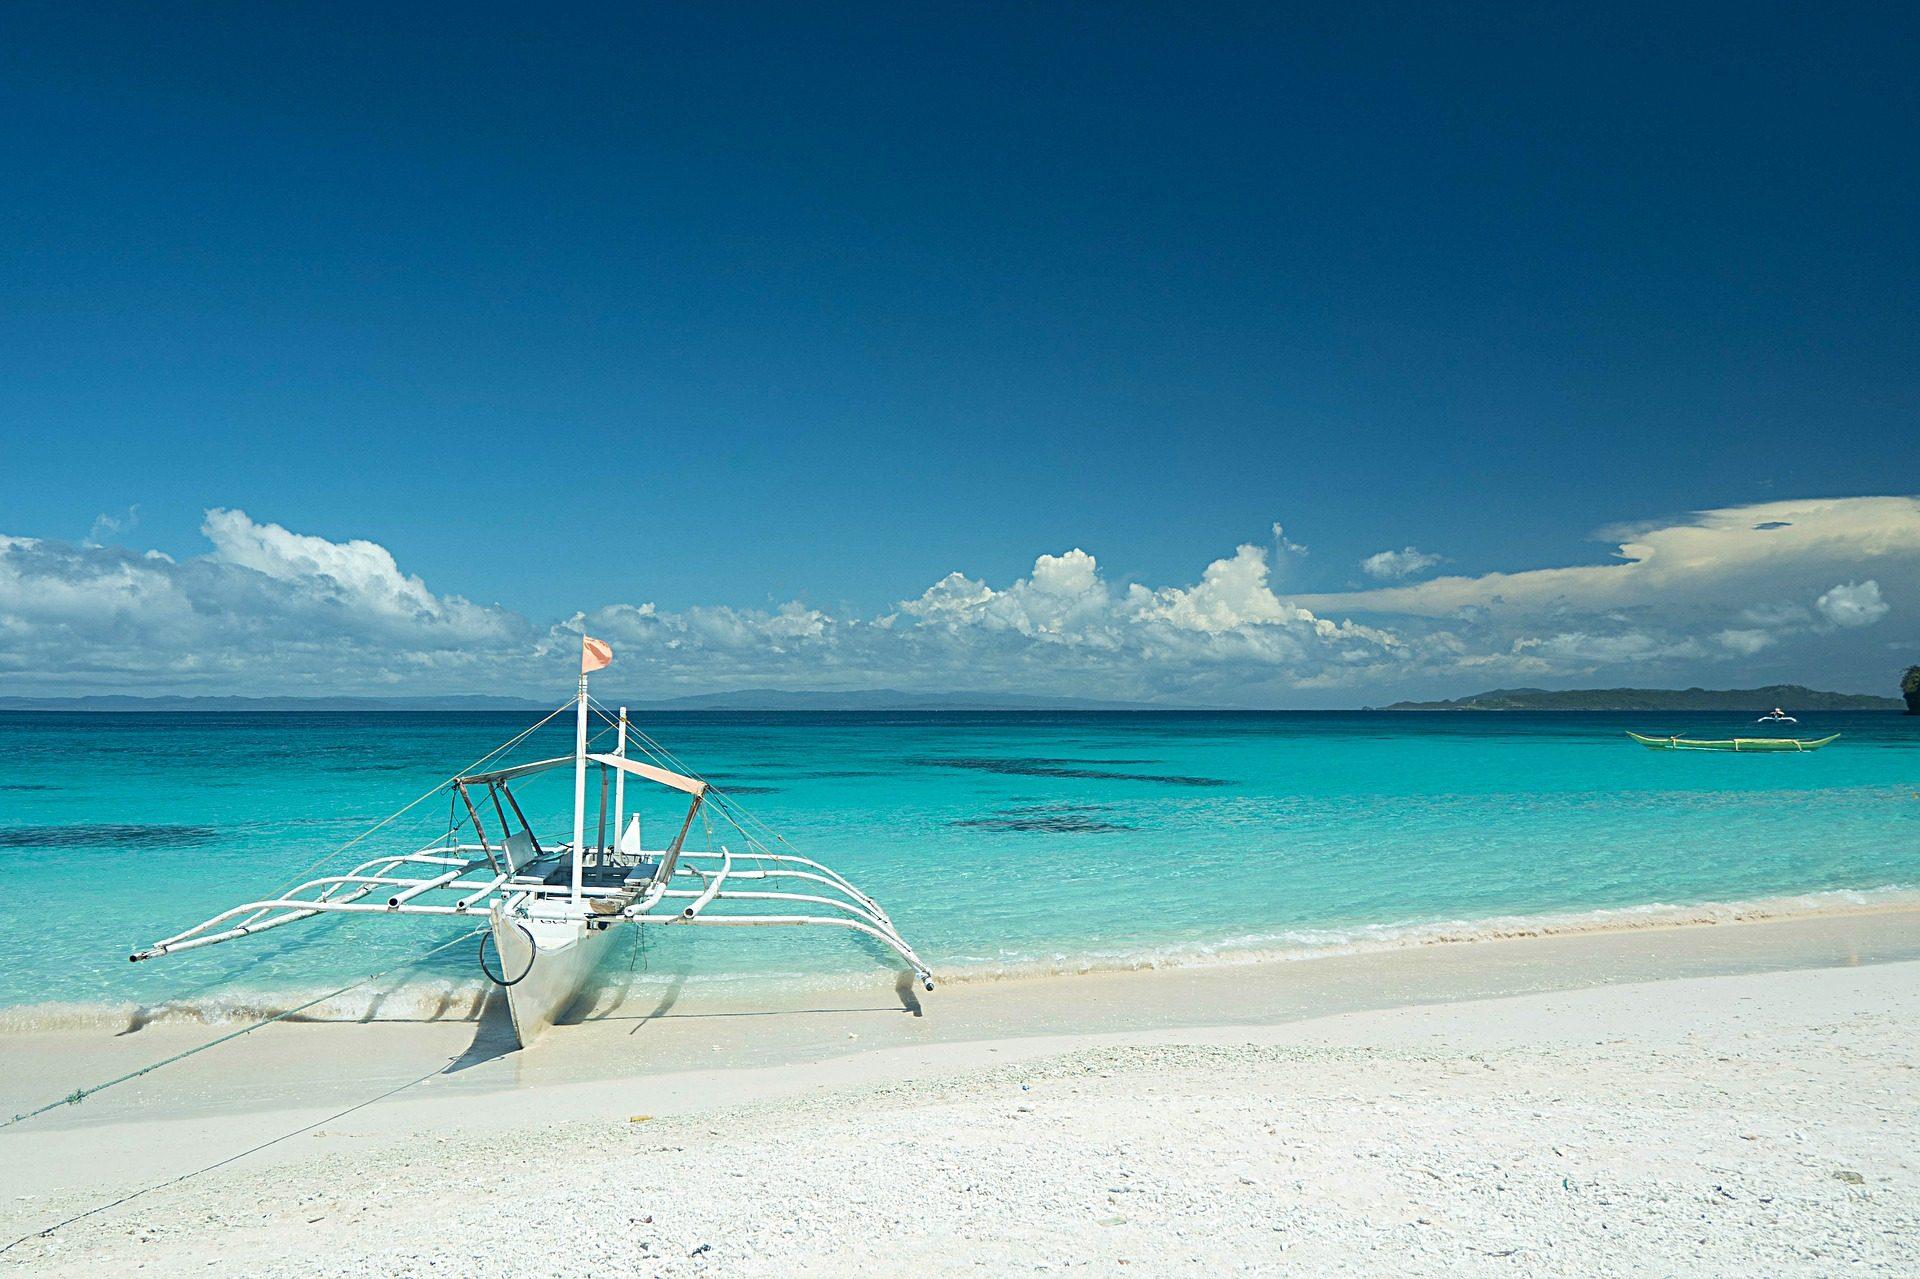 समुद्र तट, क्रिस्टल, मरकत, रेत, Barca, बादल - HD वॉलपेपर - प्रोफेसर-falken.com